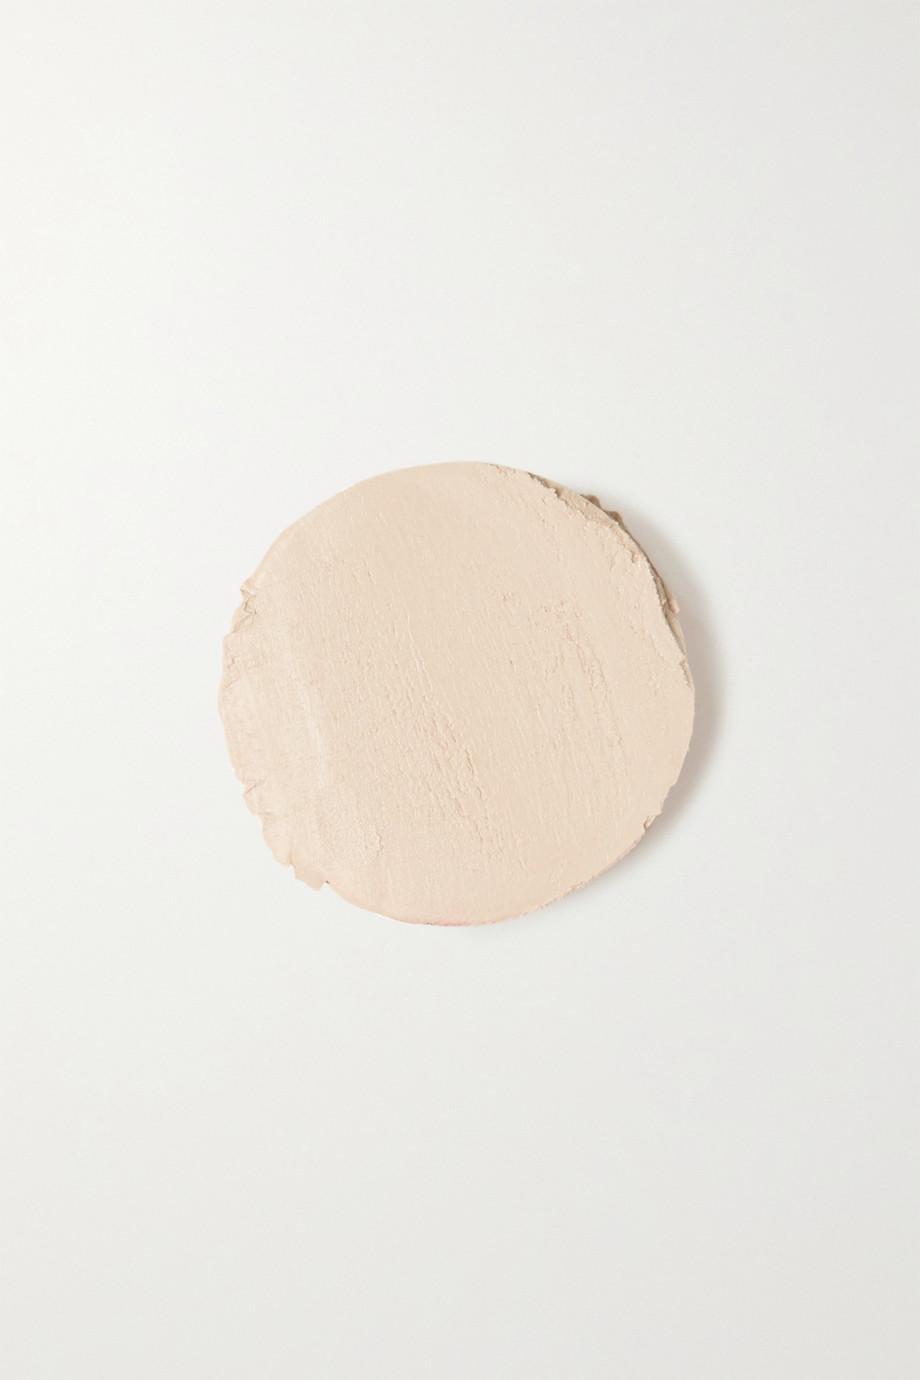 Westman Atelier Vital Skin Foundation Stick - Atelier N